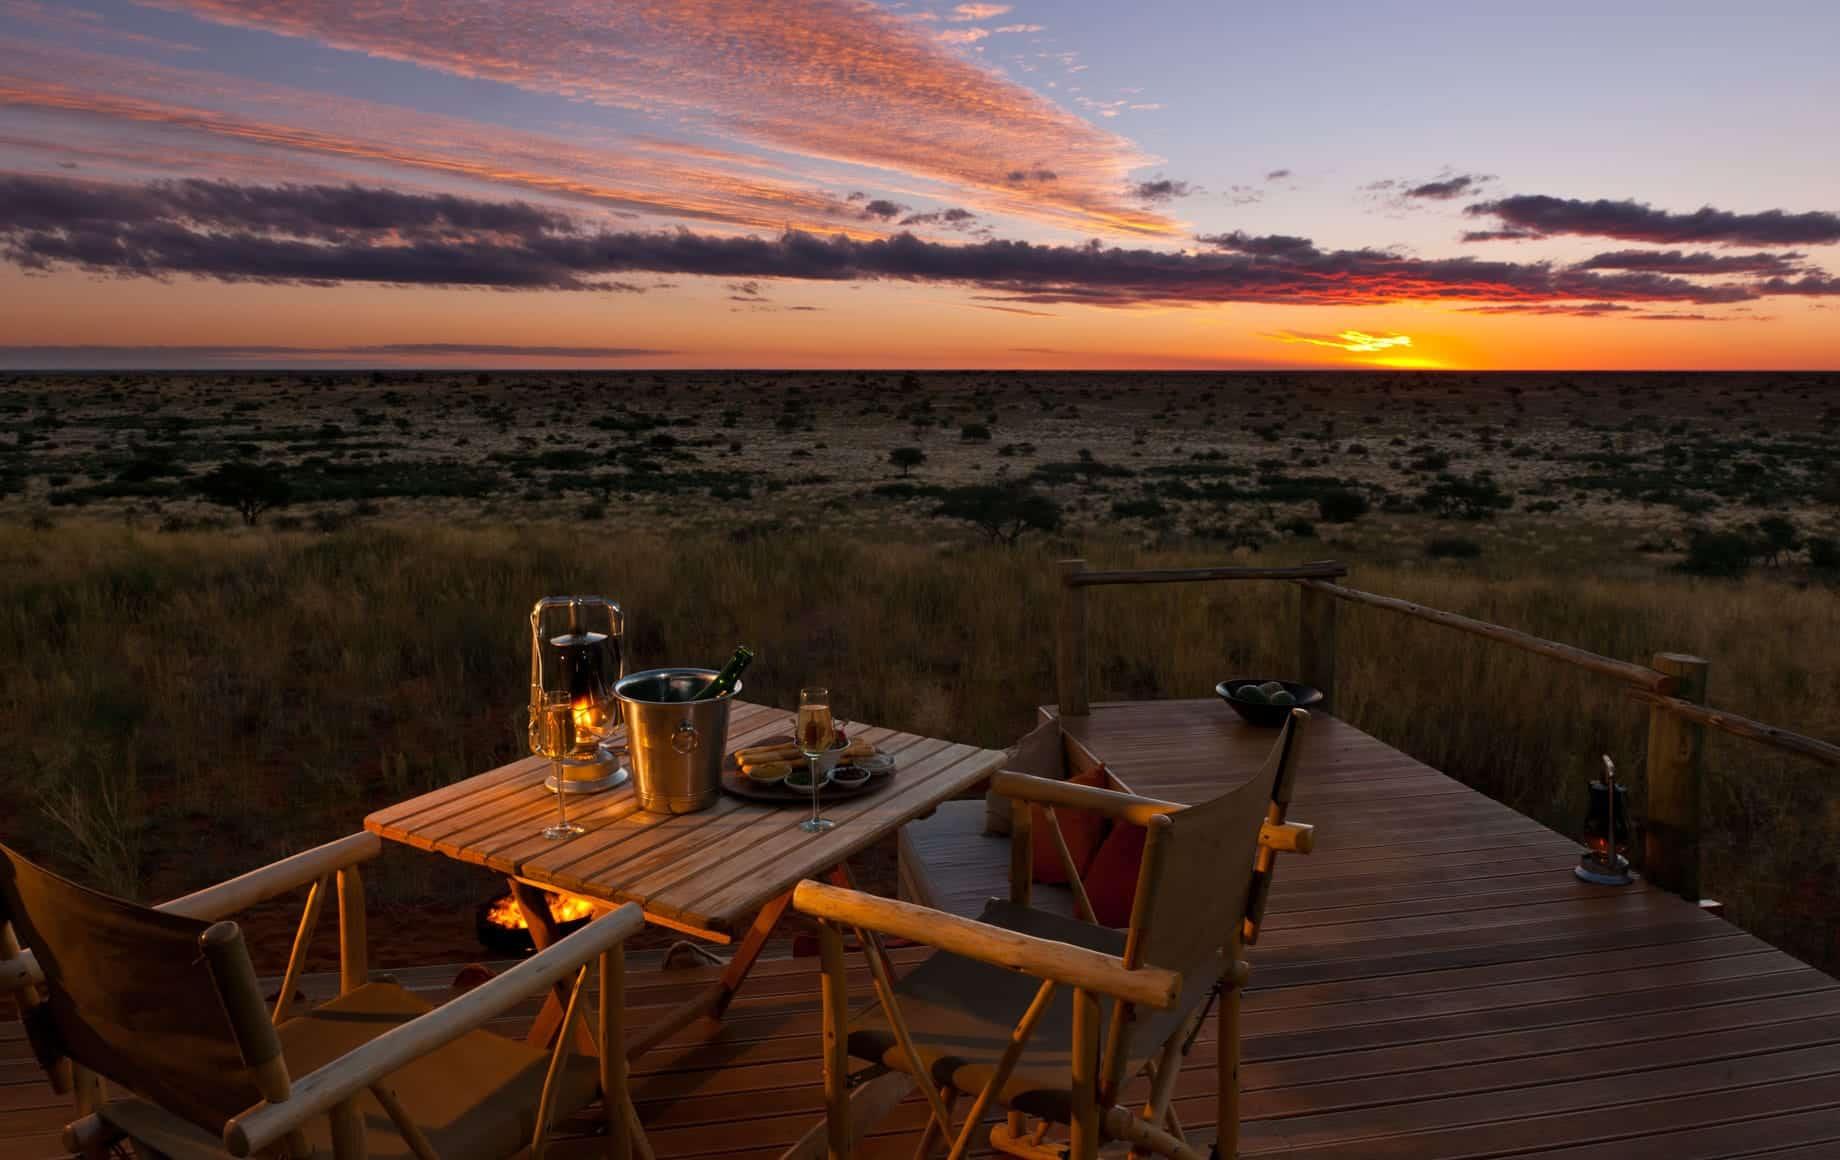 Tswalu Kalahari Reserve Evening View